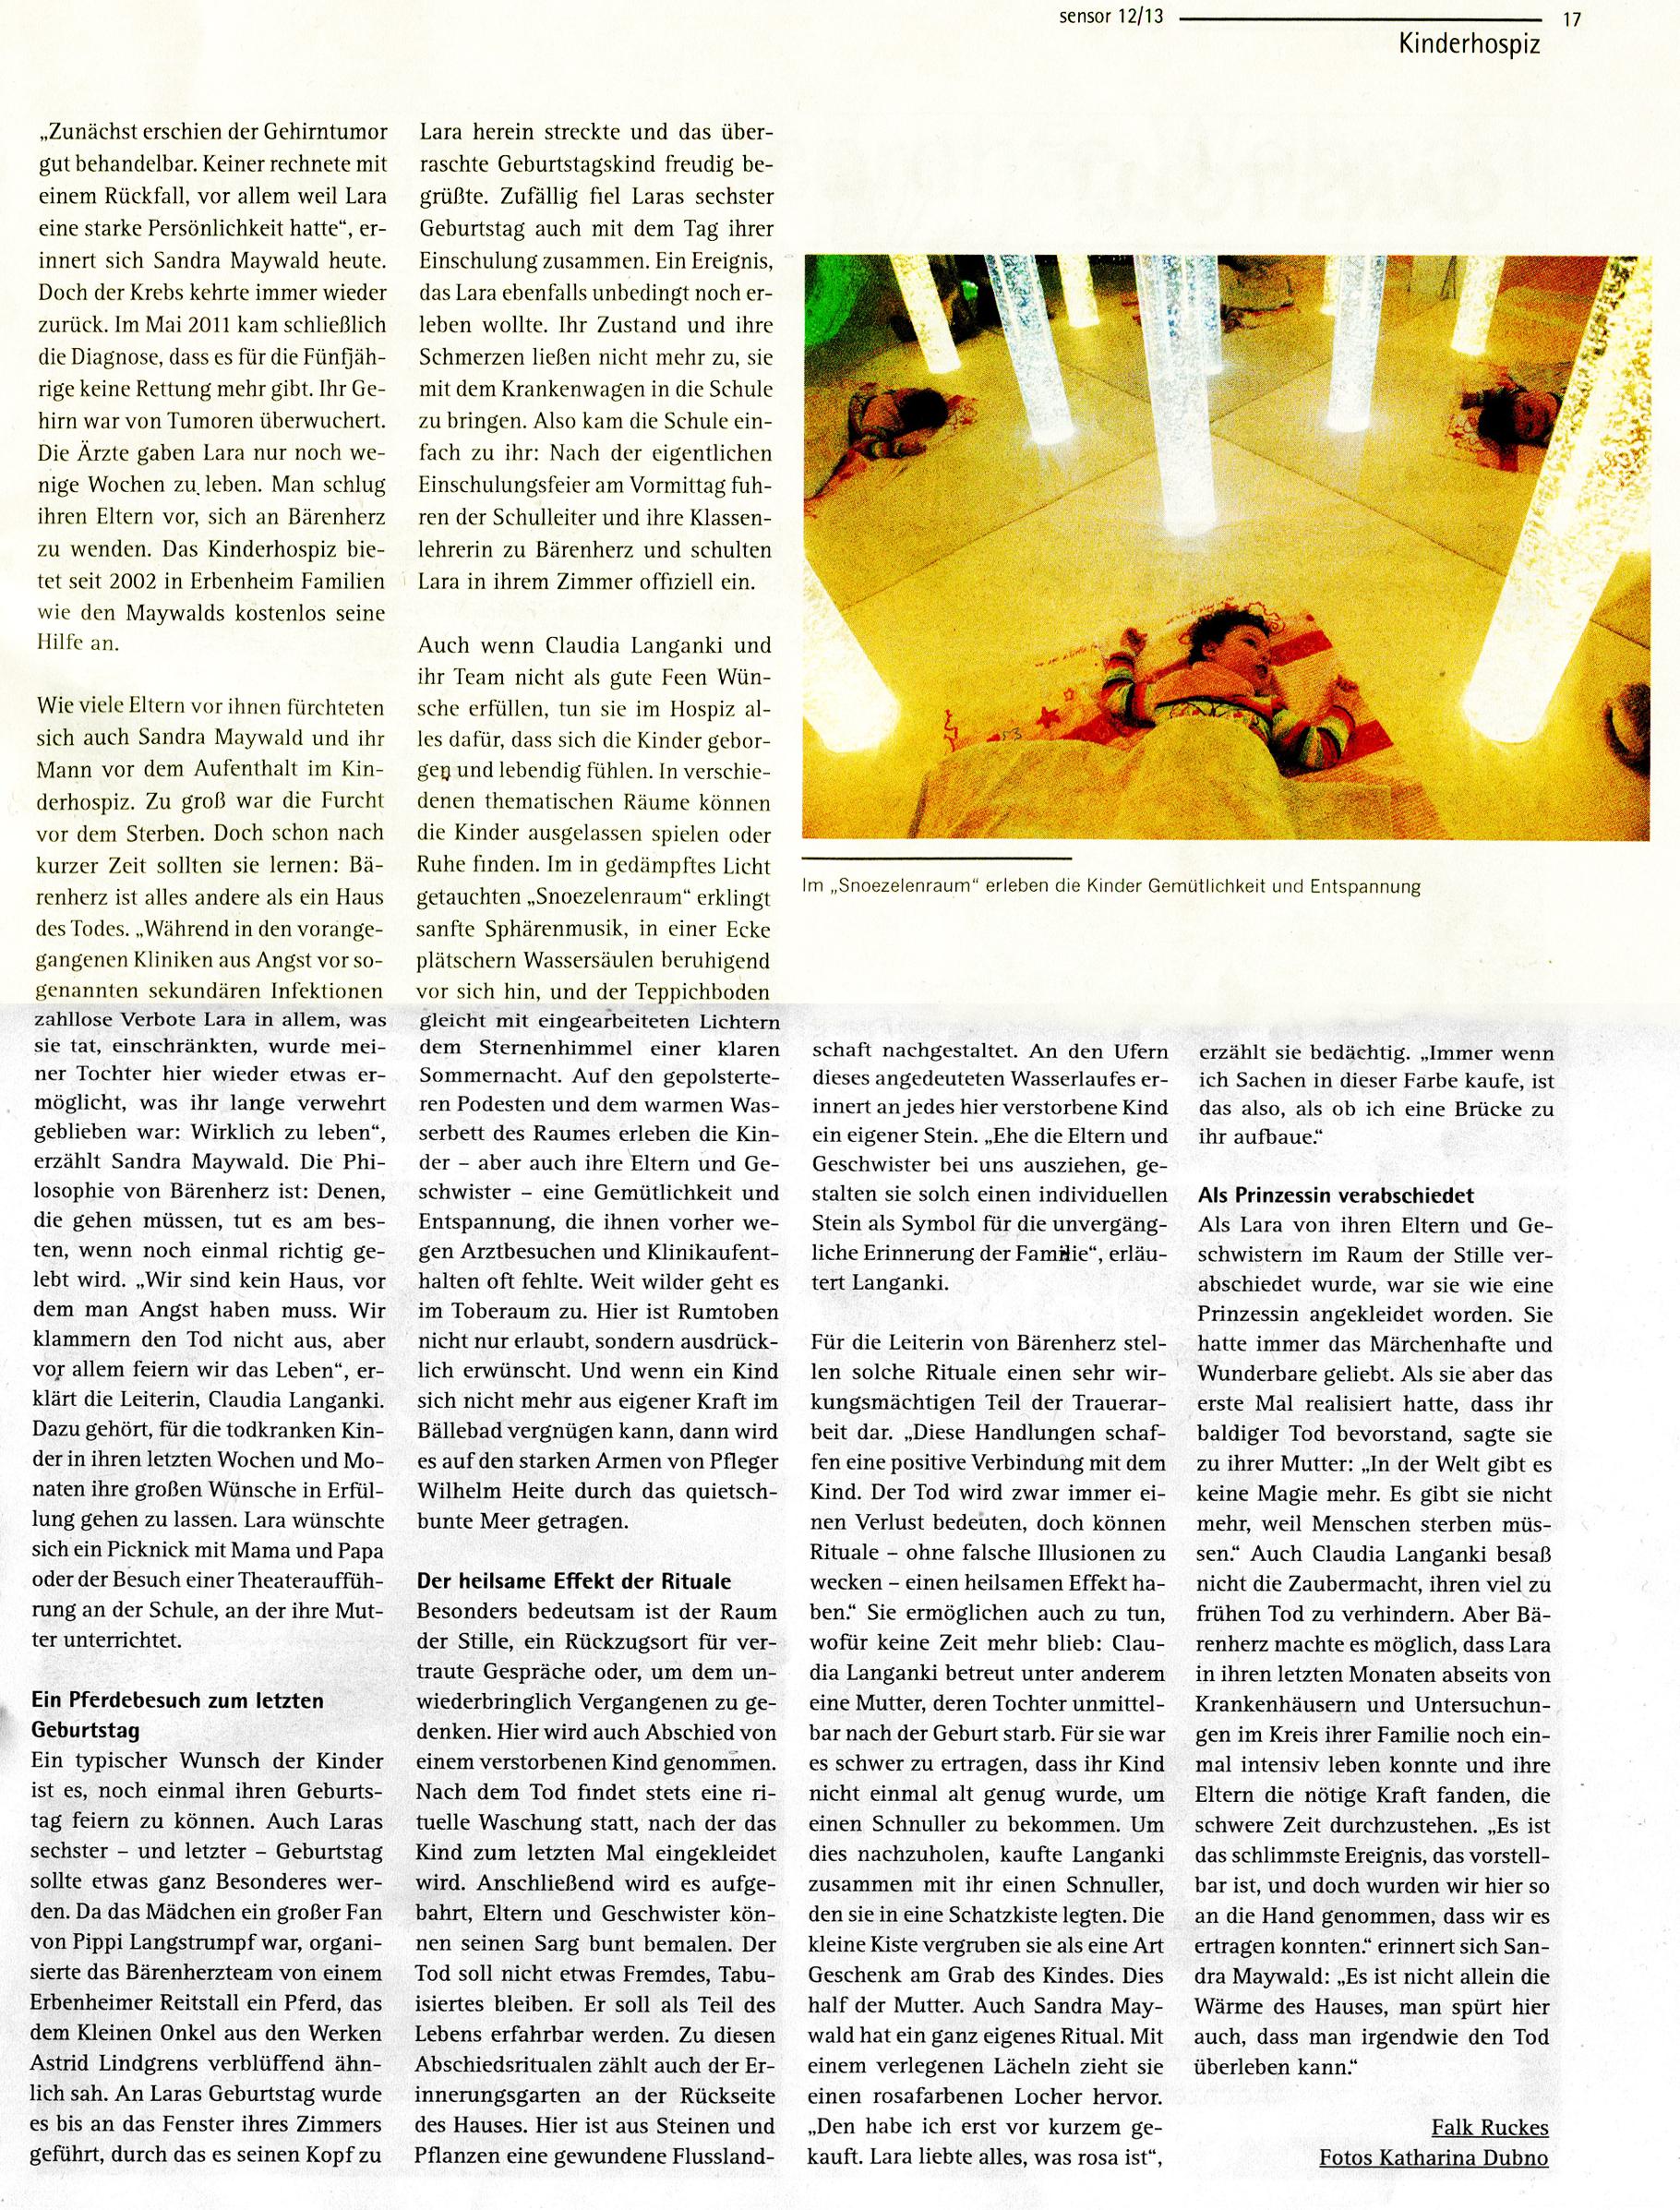 Sensor Wiesbaden Dez 2013 Januar 2014 Seite 2